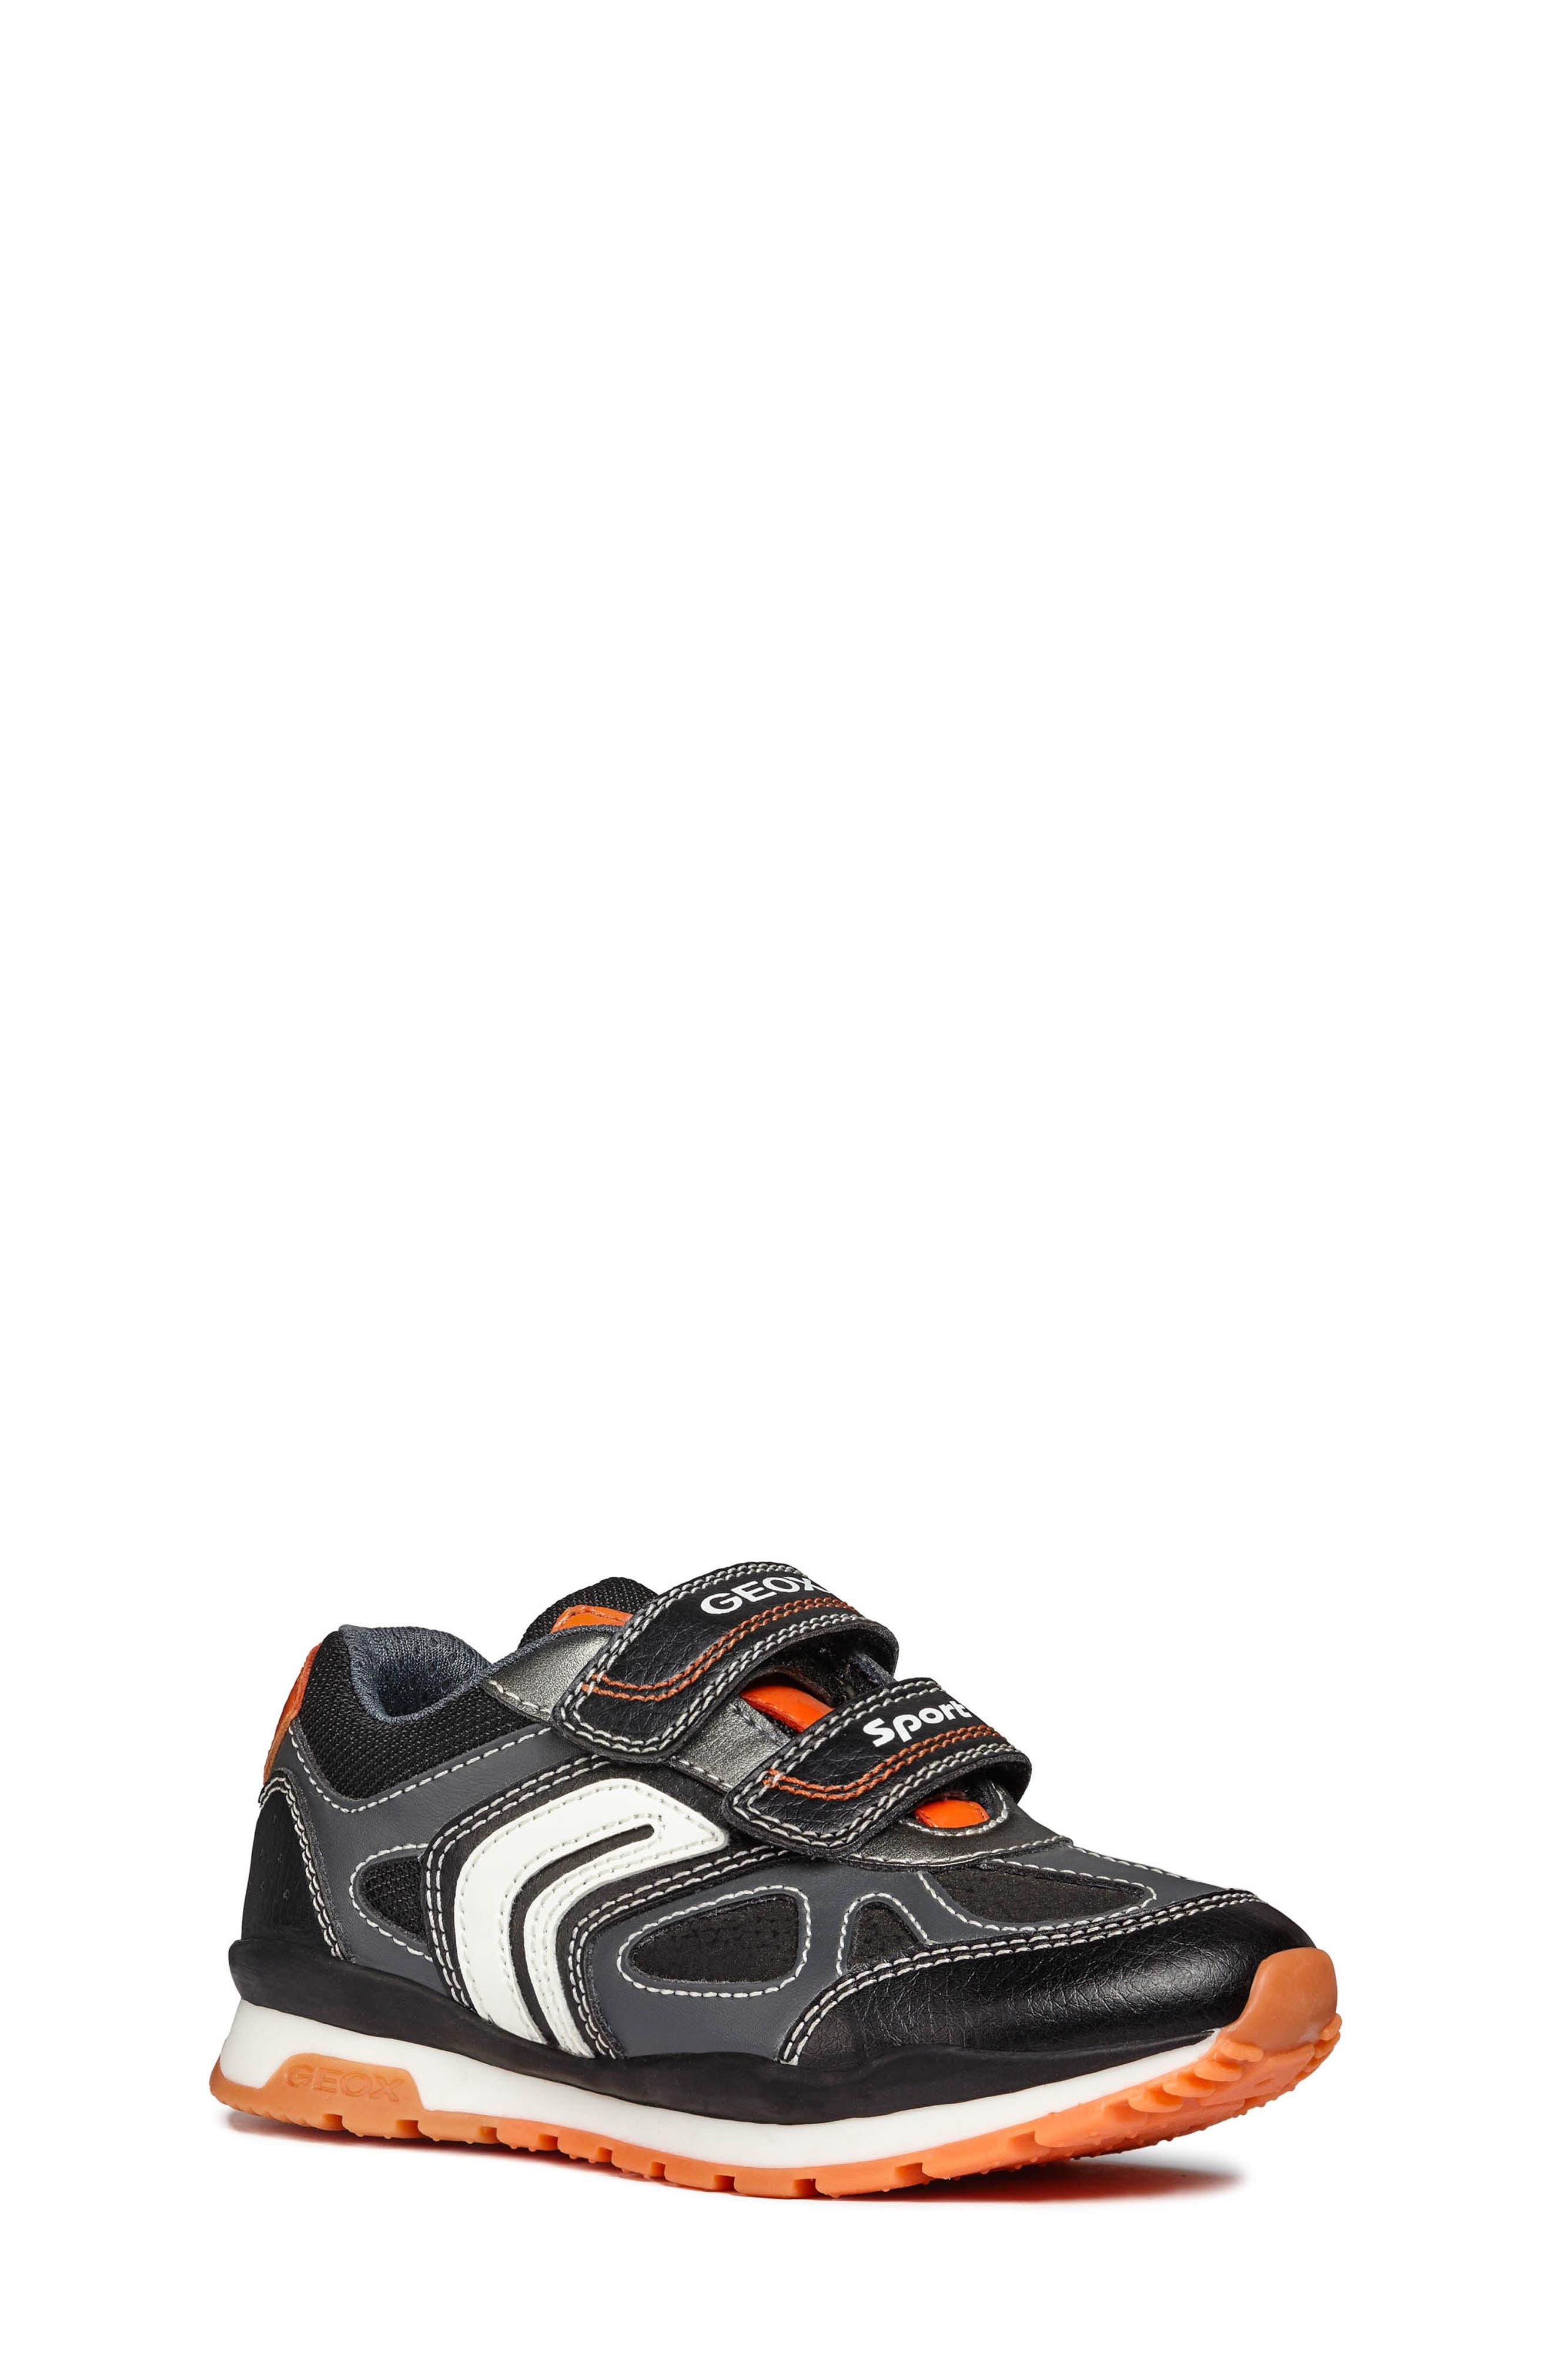 Pavel Sneaker,                         Main,                         color, DARK GREY/ORANGE